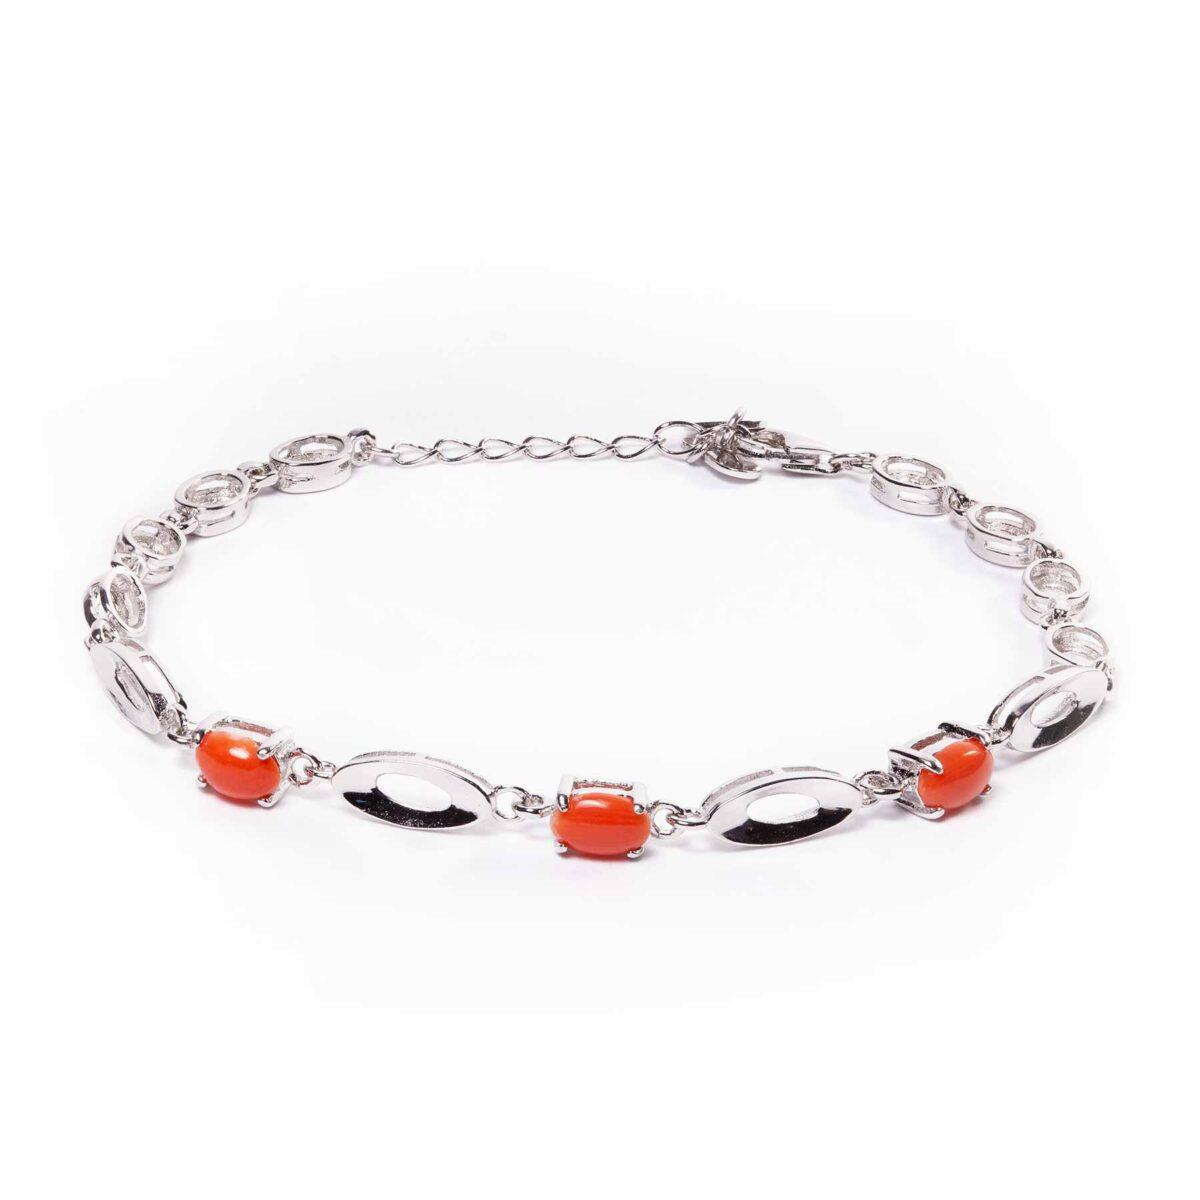 venere bracelet in silver and coral